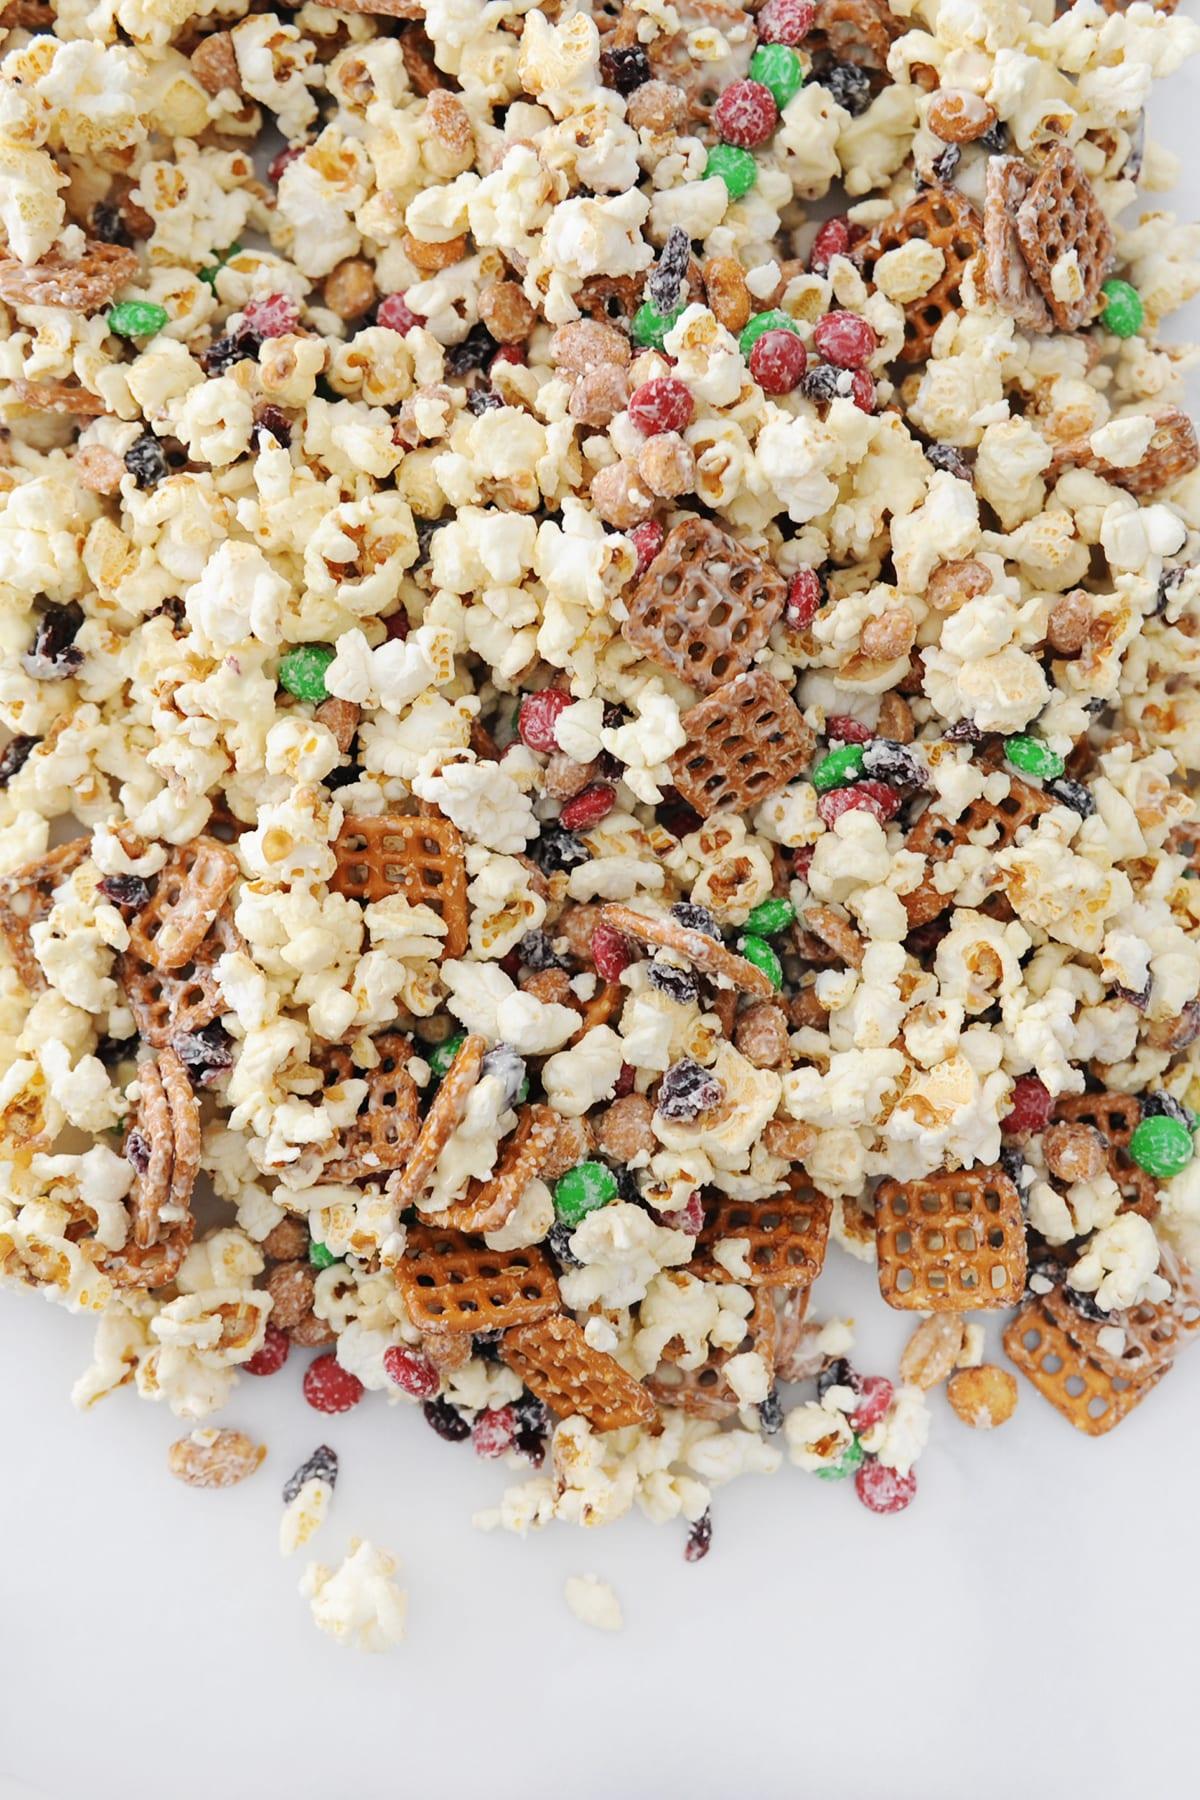 Popcorn snack mix ideas